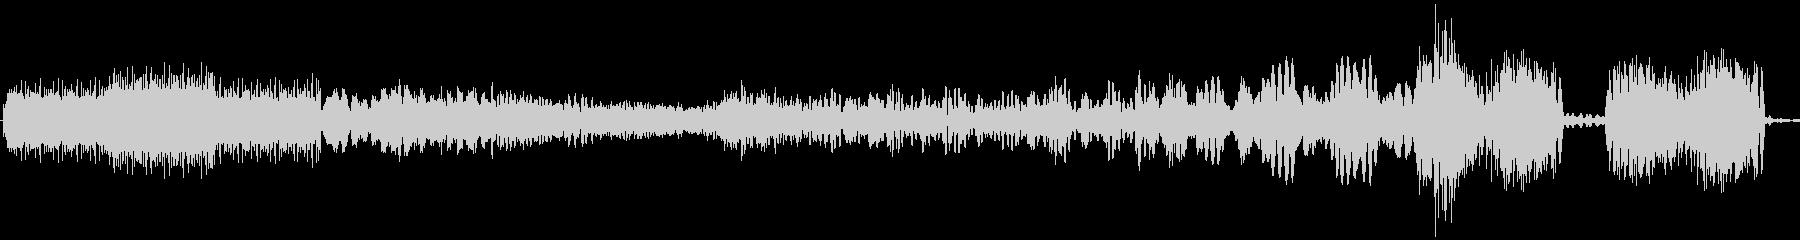 SciFi EC01_92_4の未再生の波形